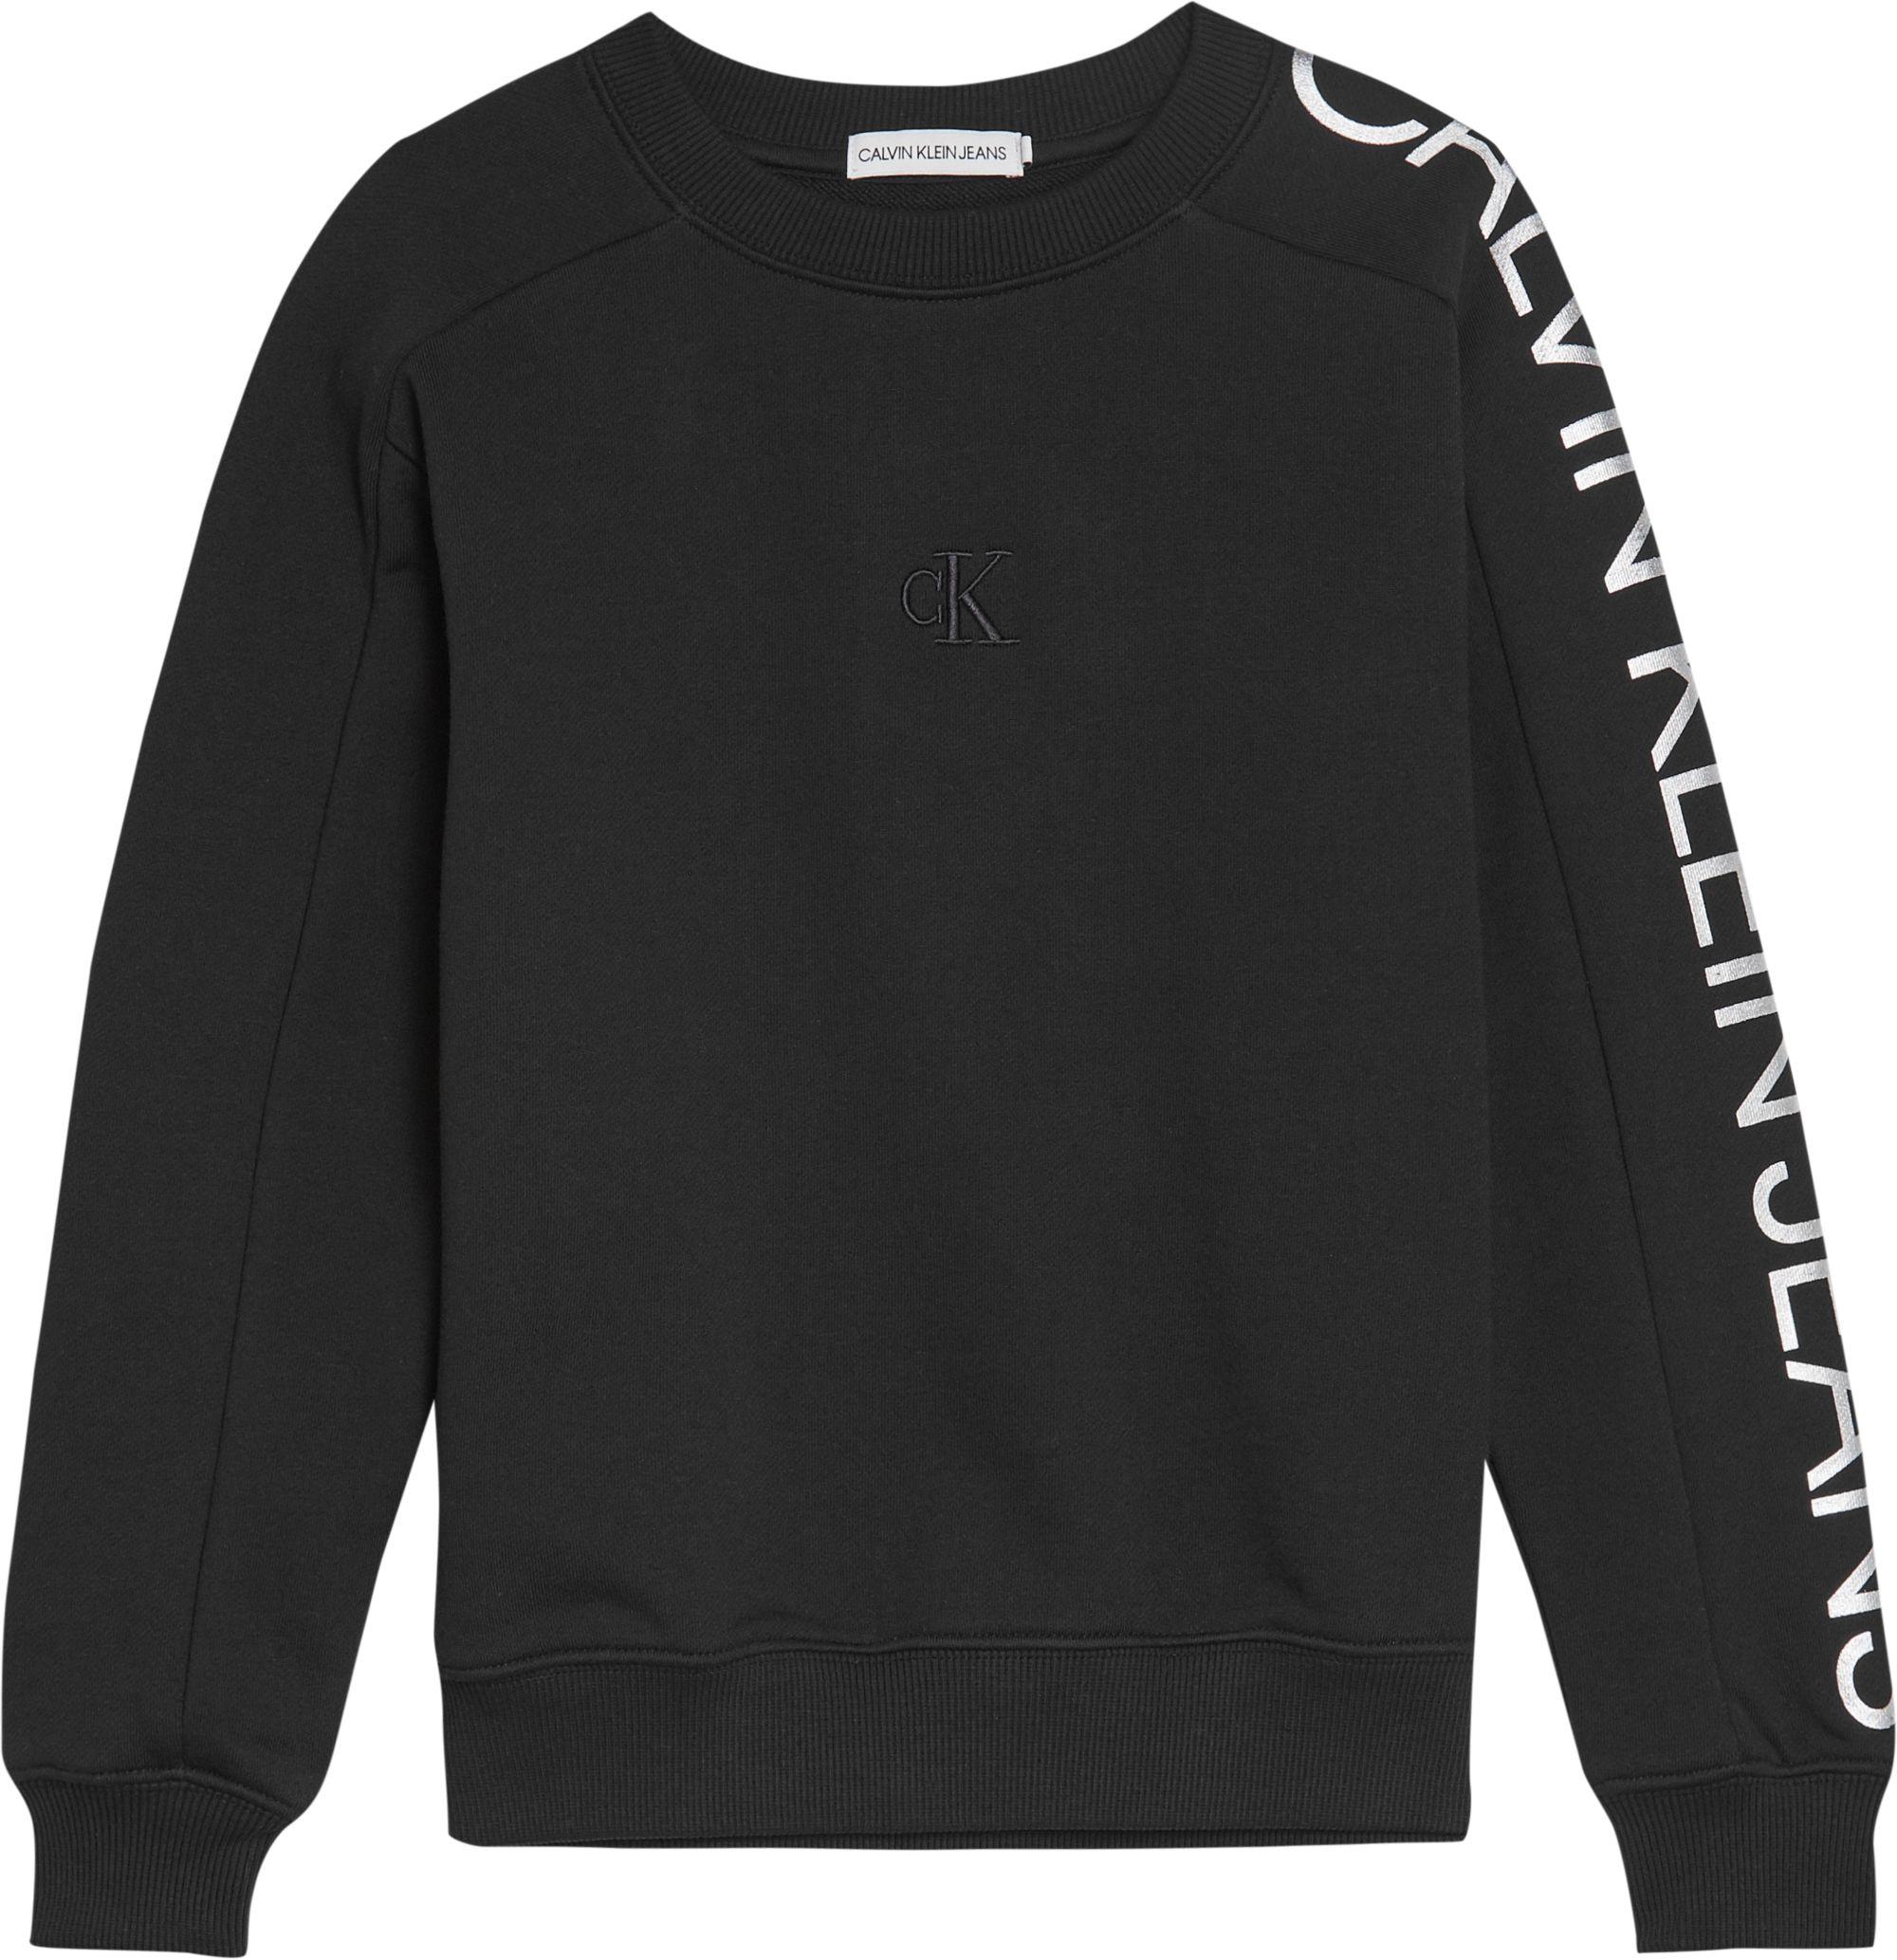 Calvin Klein, Foil logo sleeve collegepaita